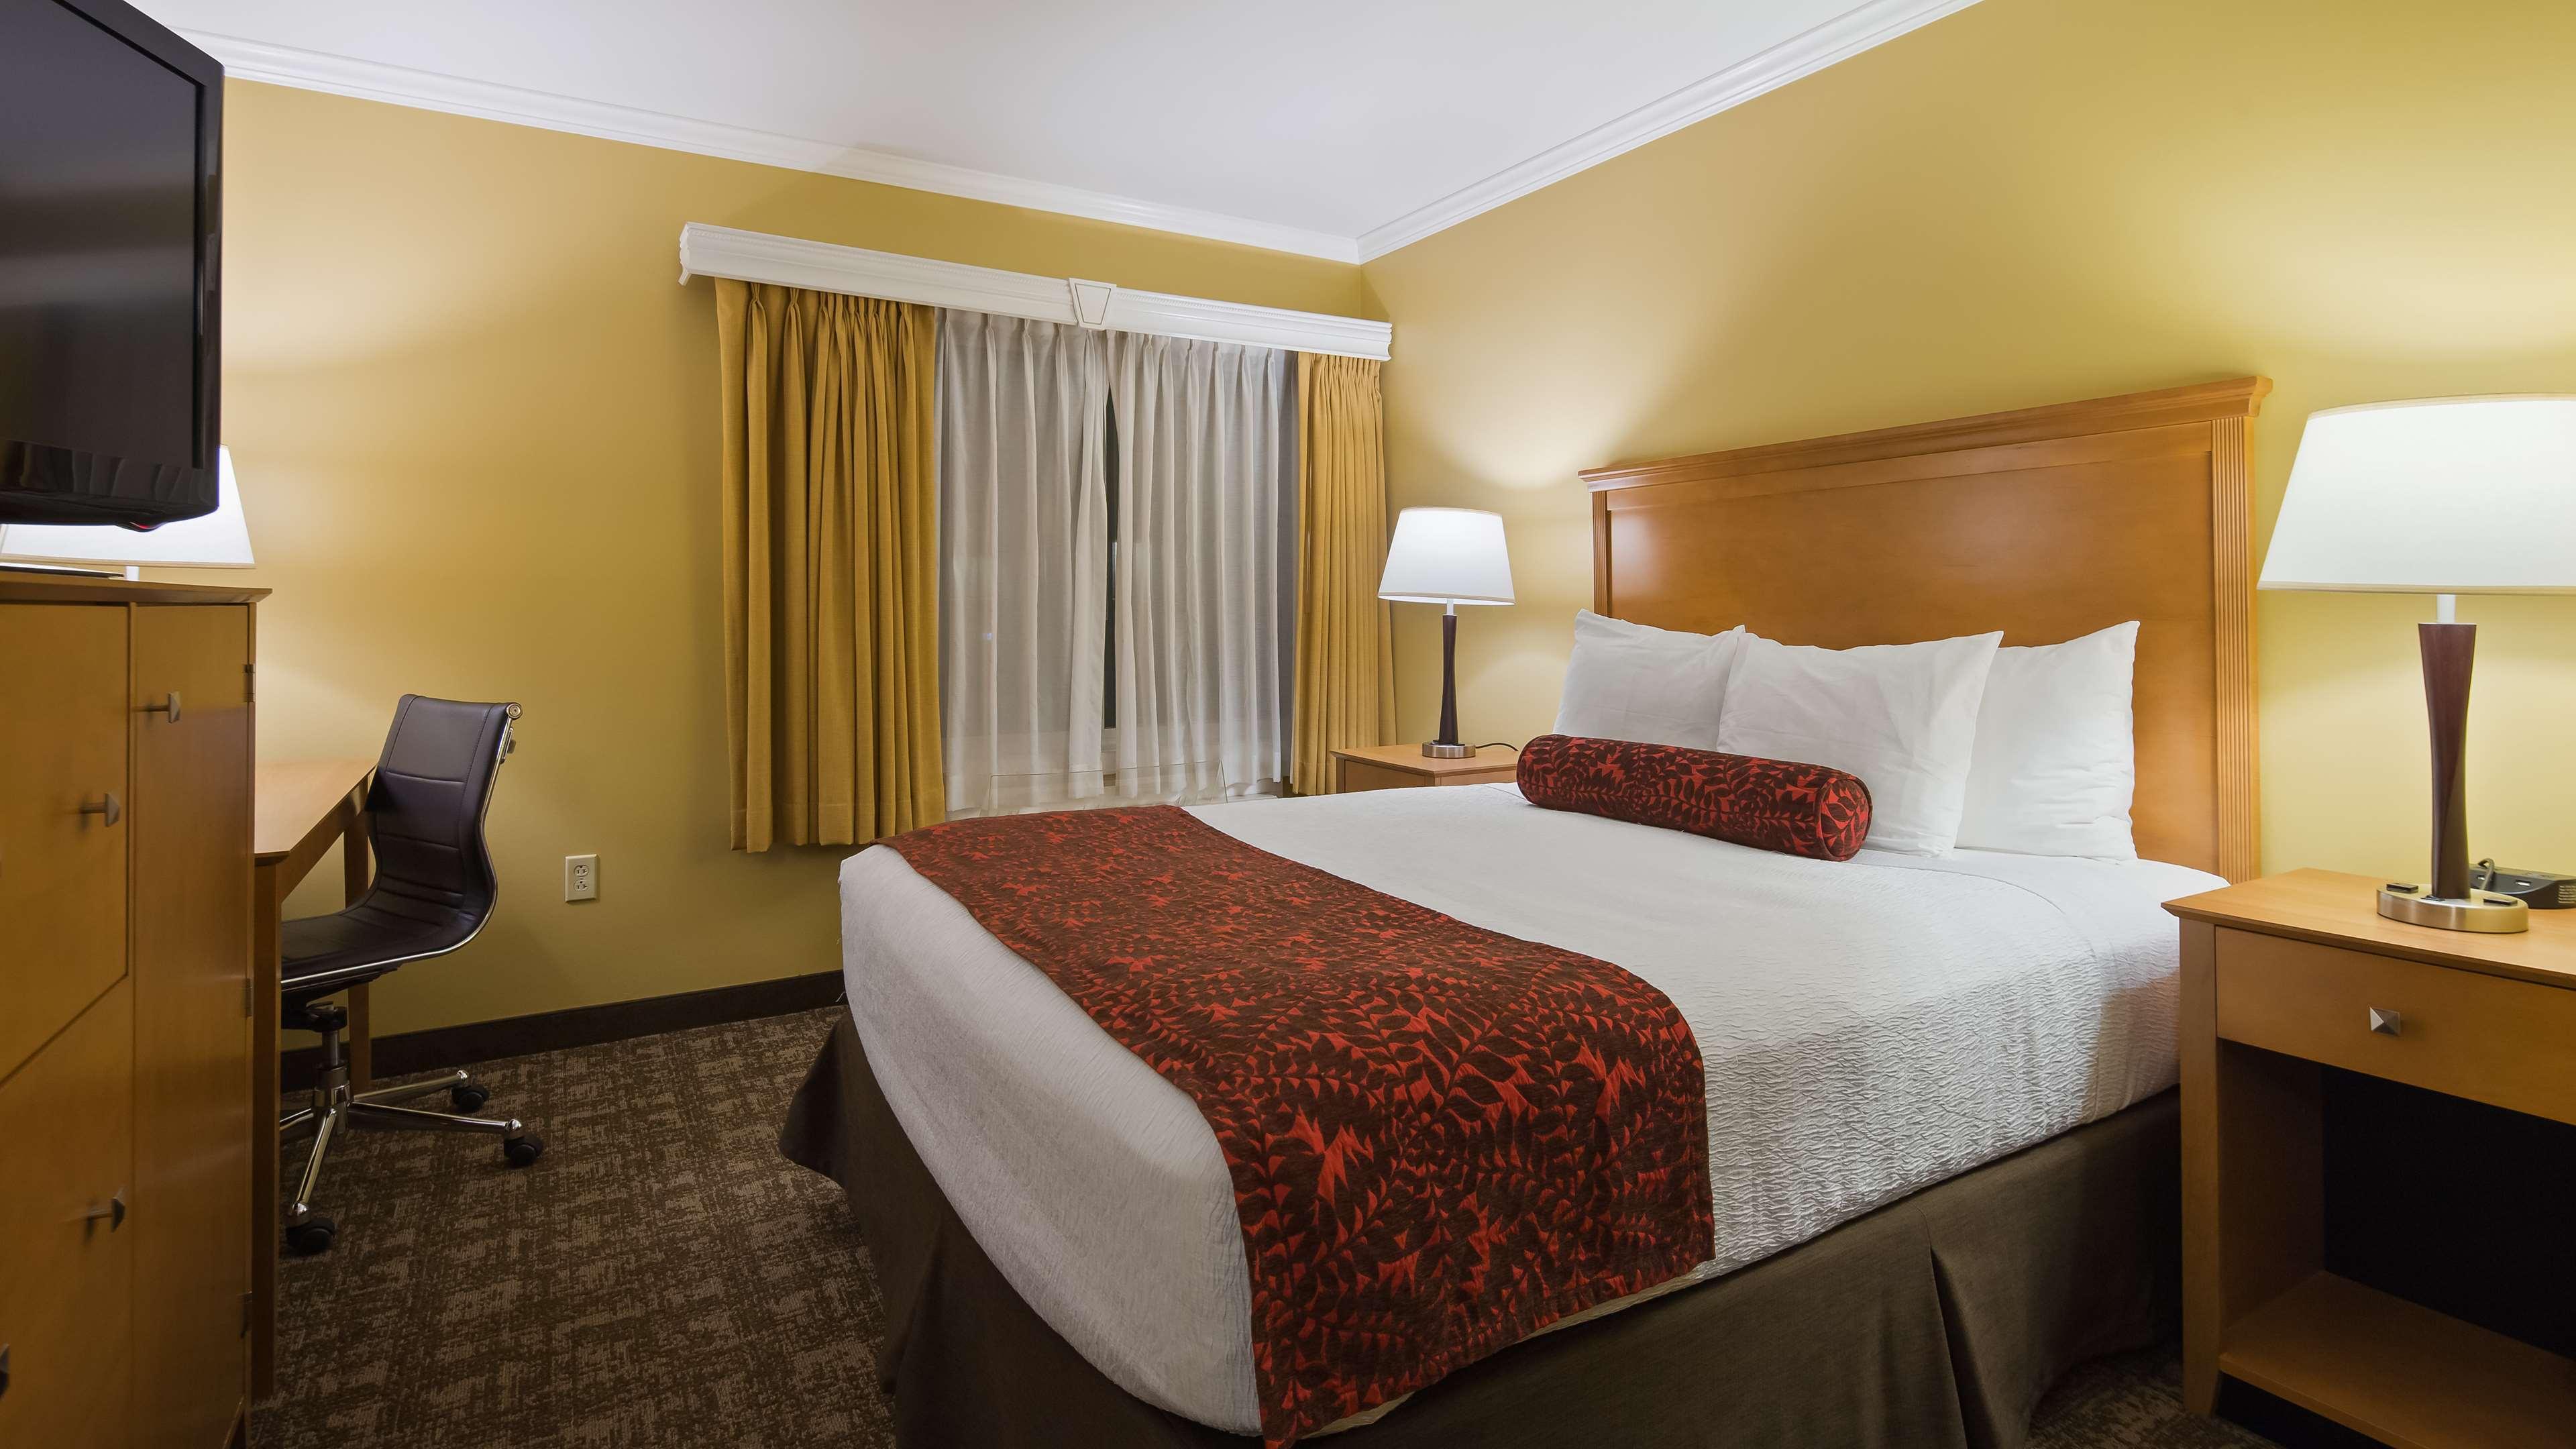 Best Western Plus Windjammer Inn & Conference Center image 23